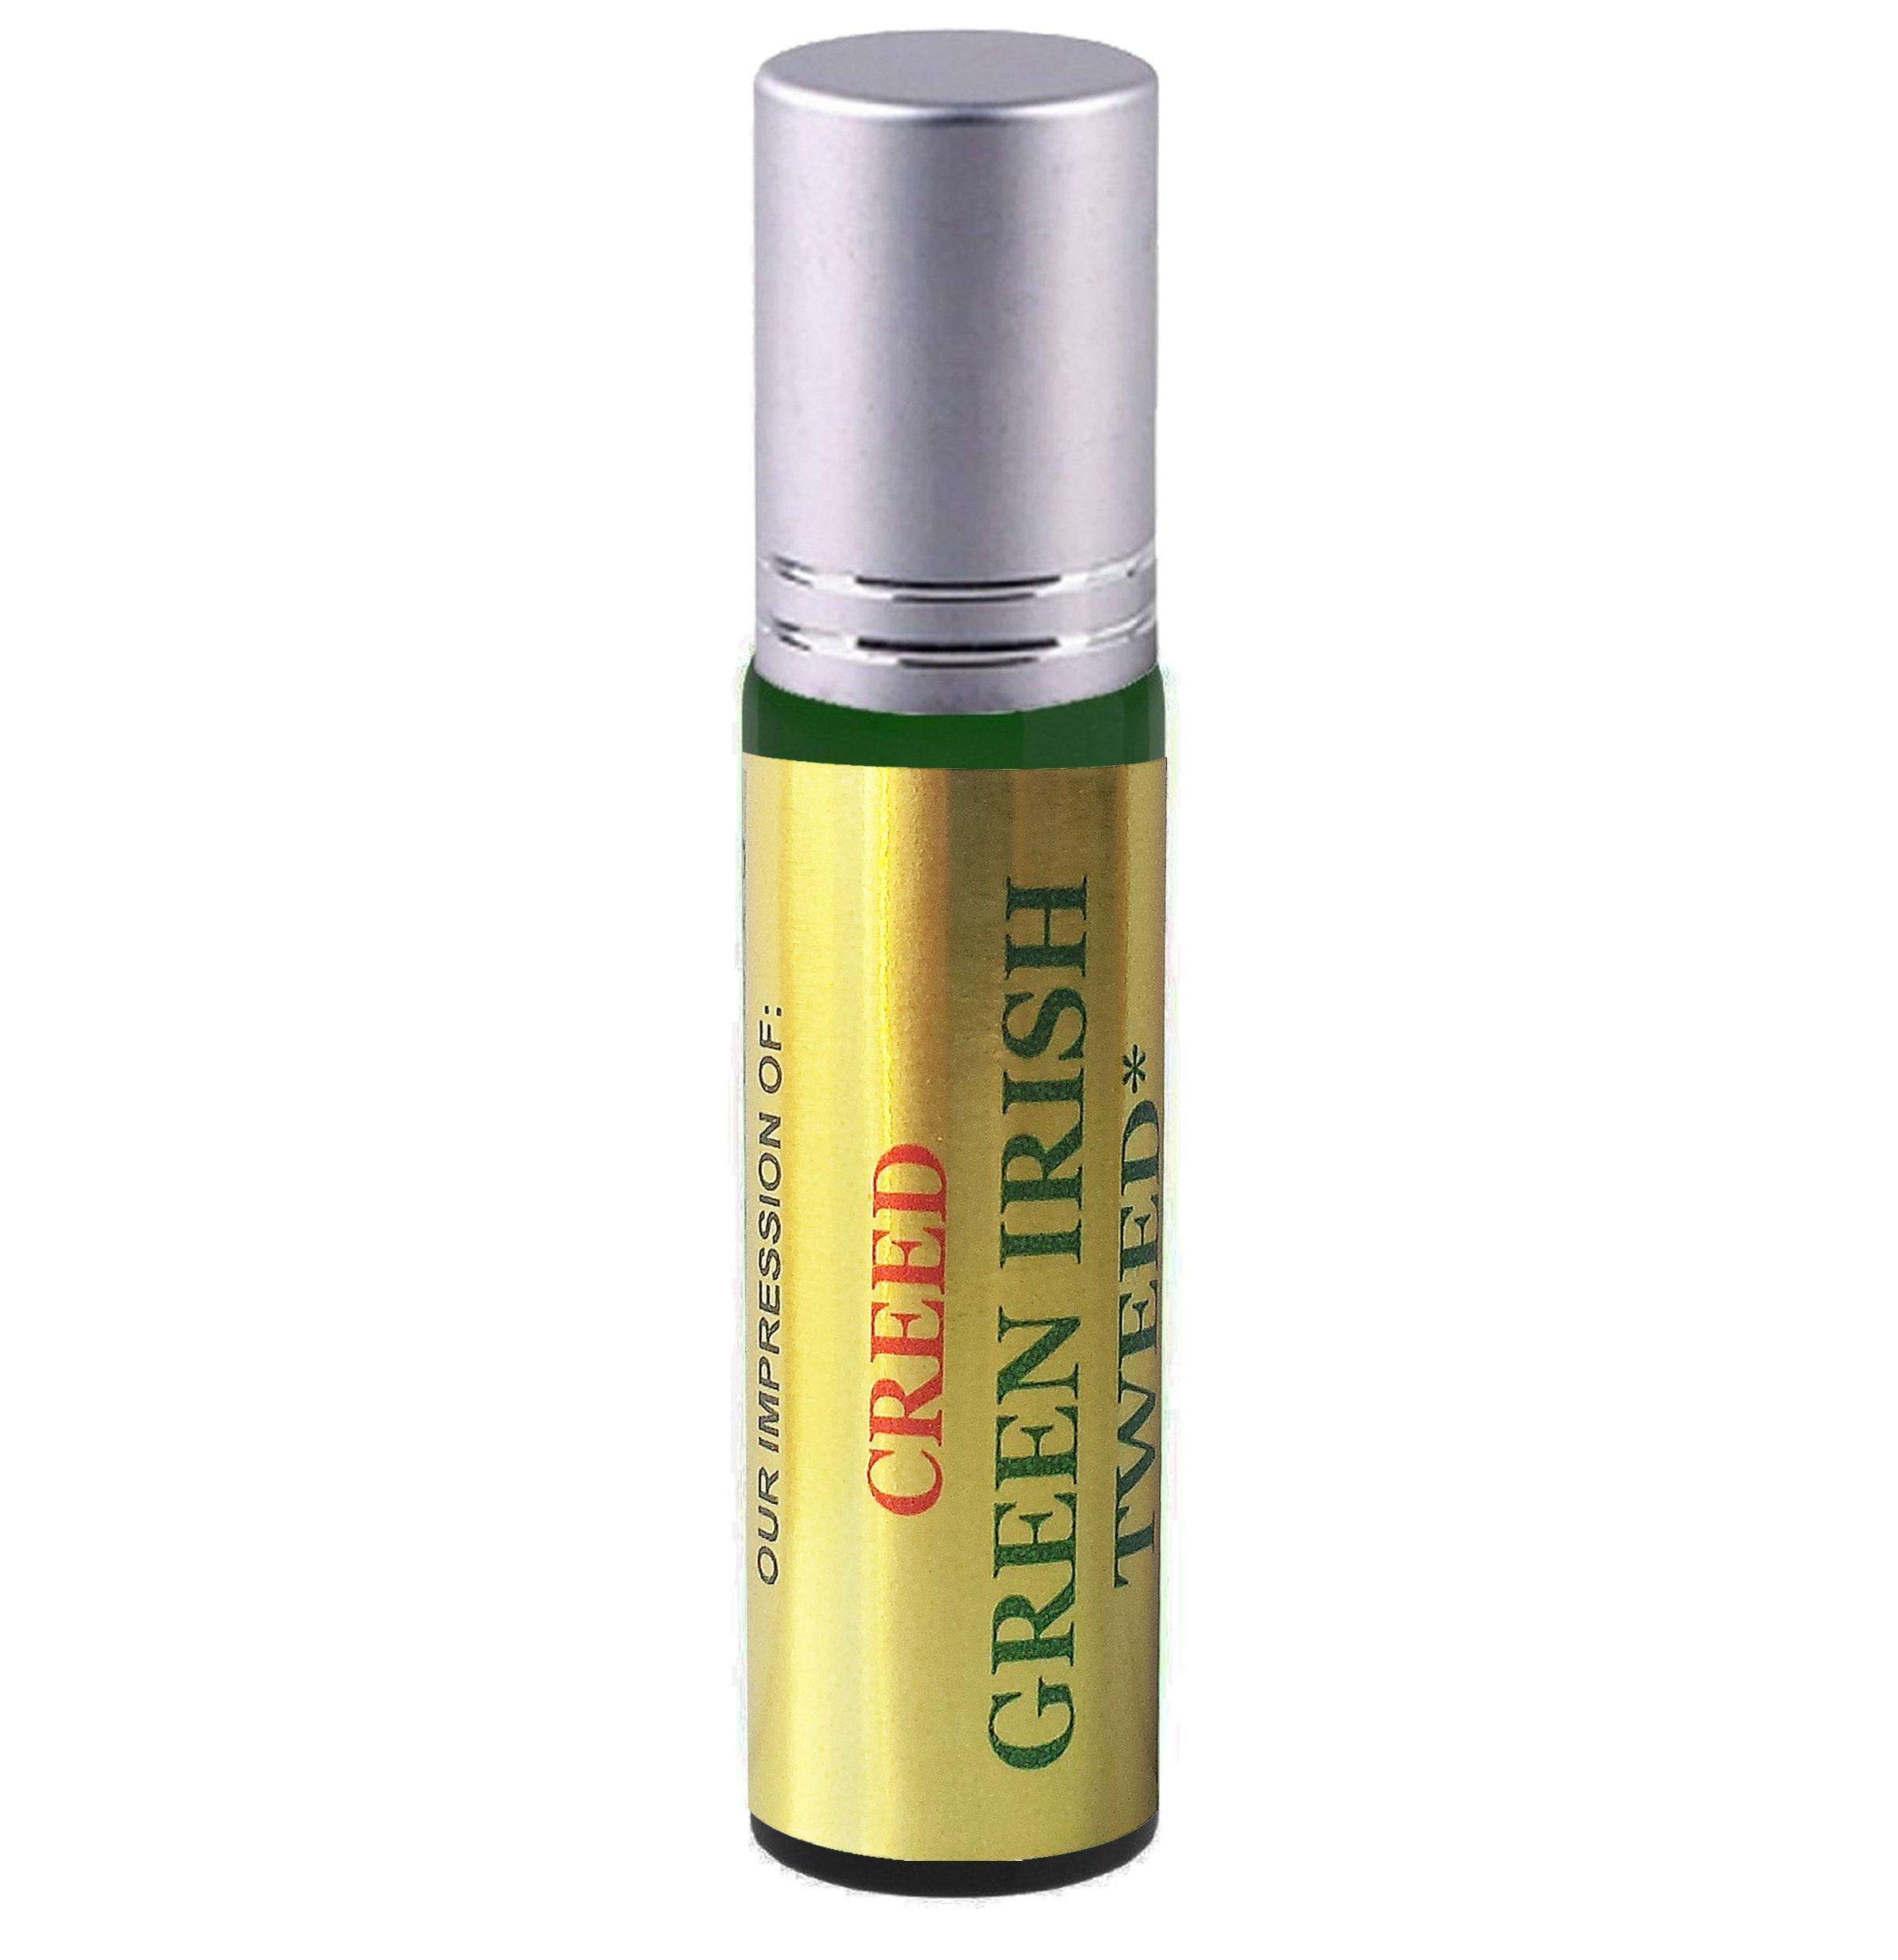 Premium Parfum Oil Blend Similar to Green Irish Tweed Perfume 100% Pure Perfume, Alcohol Free in a 10ml Green Glass Roller Bottle with Metal Ball, Silver Cap (Perfume Studio Oil Blend CF-103)